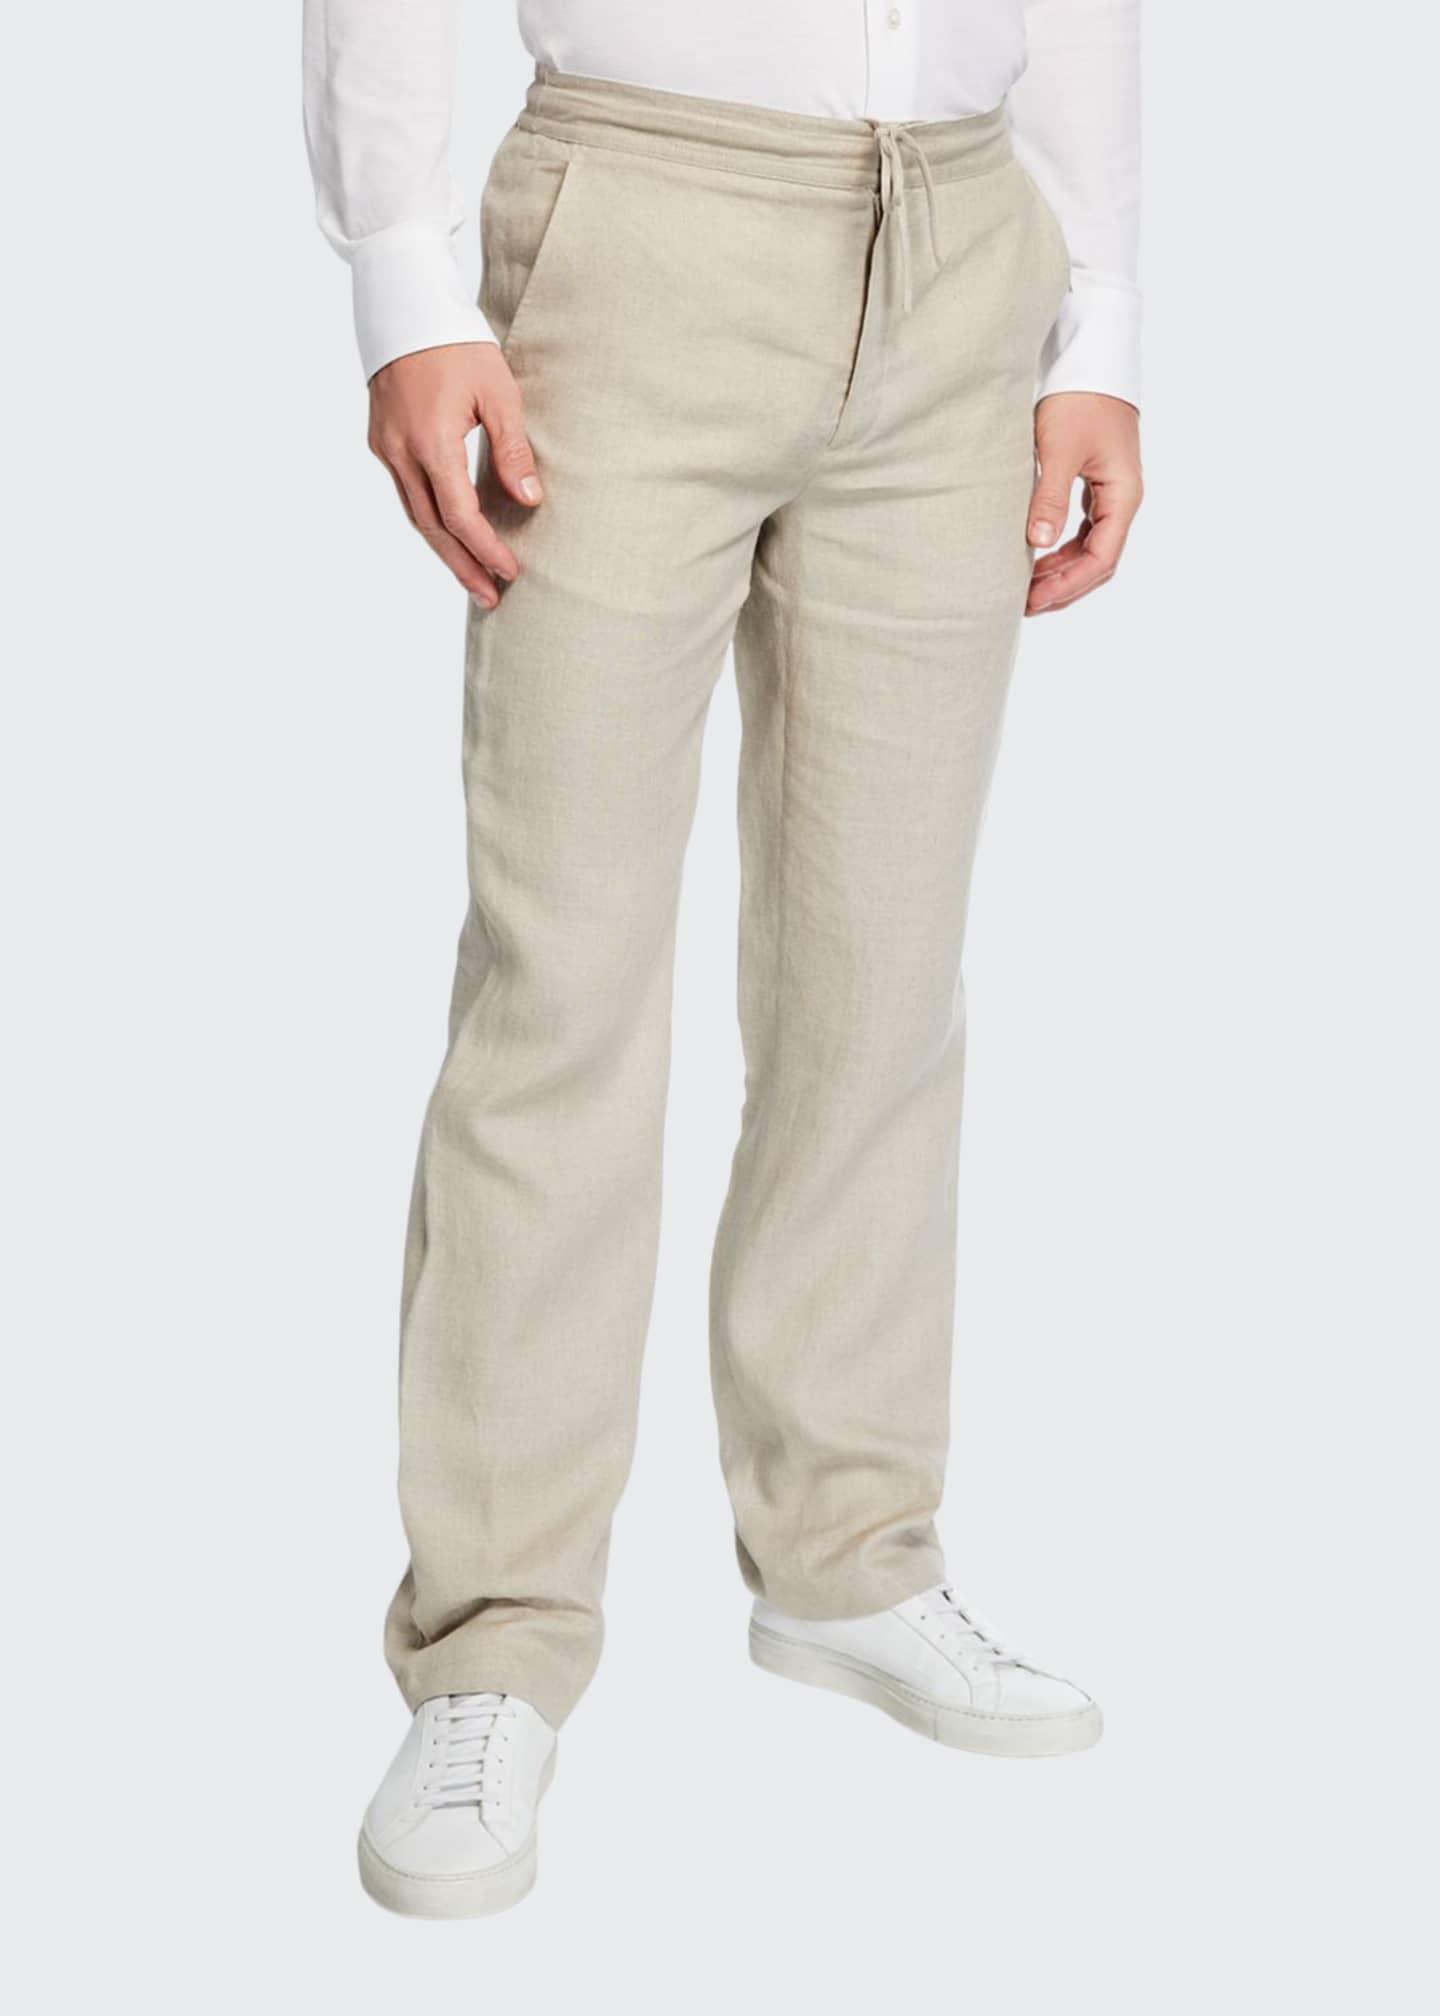 Brioni Men's Linen Drawstring Straight-Leg Pants